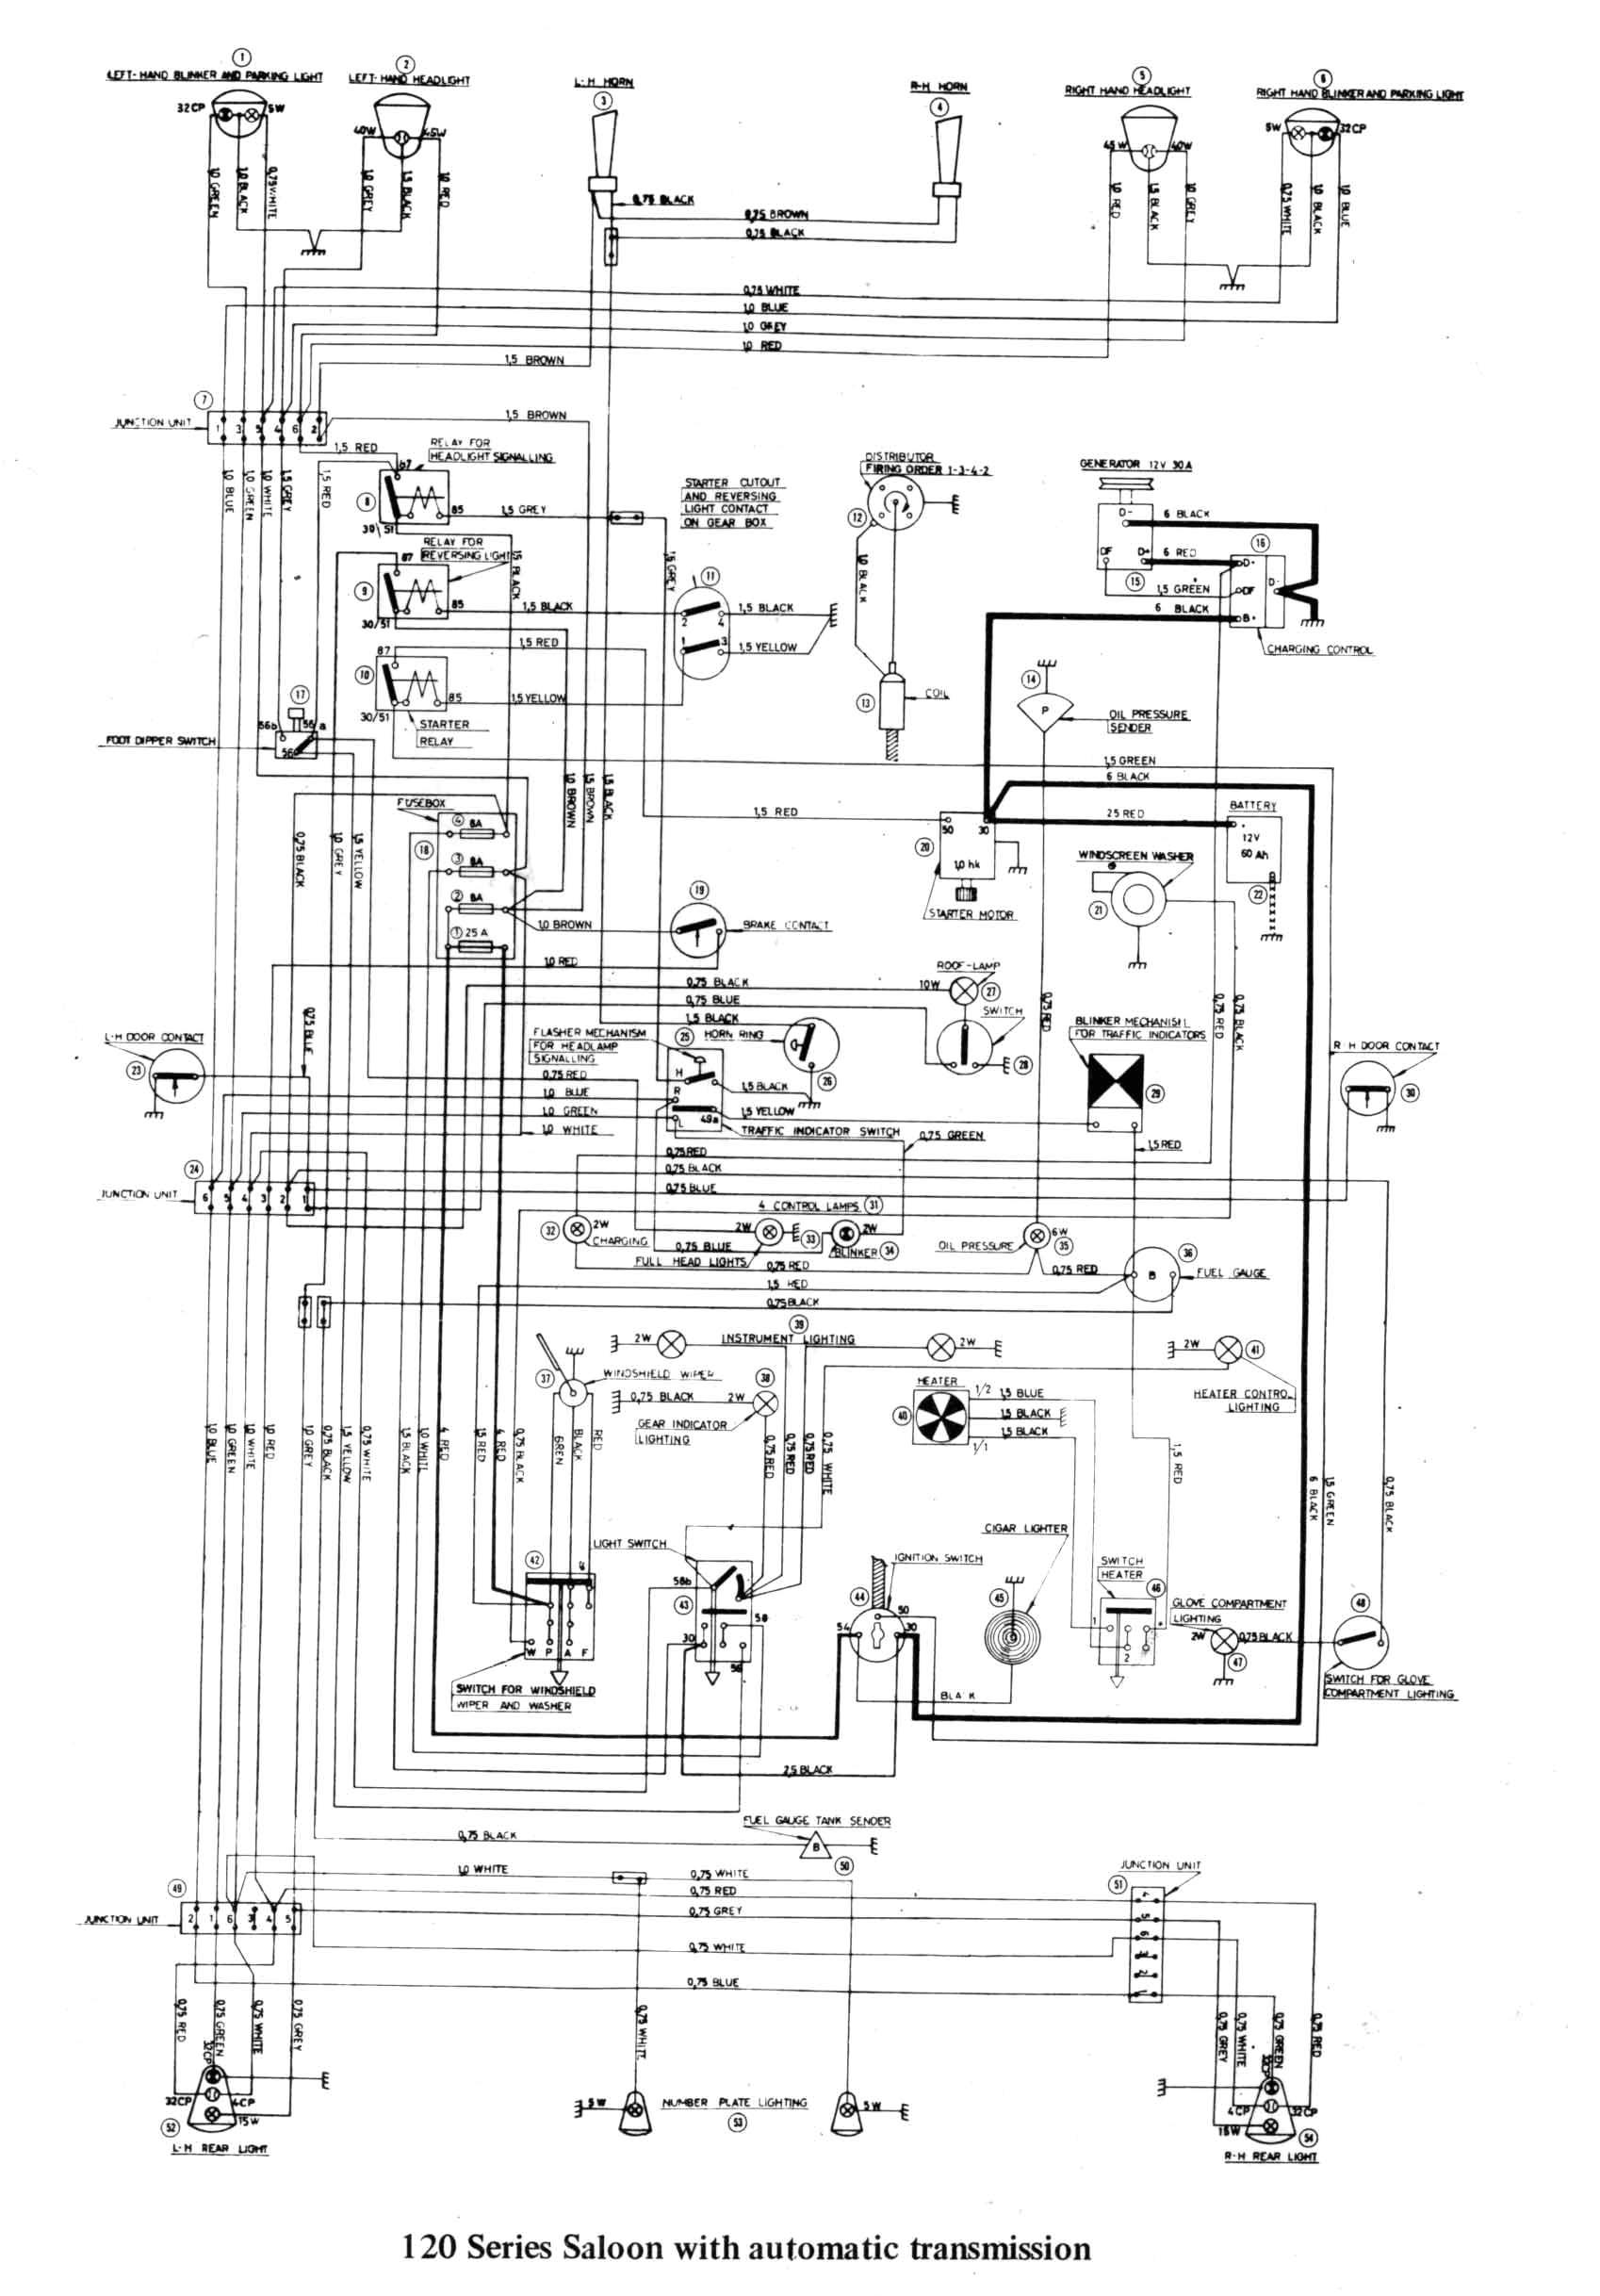 crank telephone wiring diagram beautiful sw em od retrofitting vintage volvo refer wiring diagram 122s showy